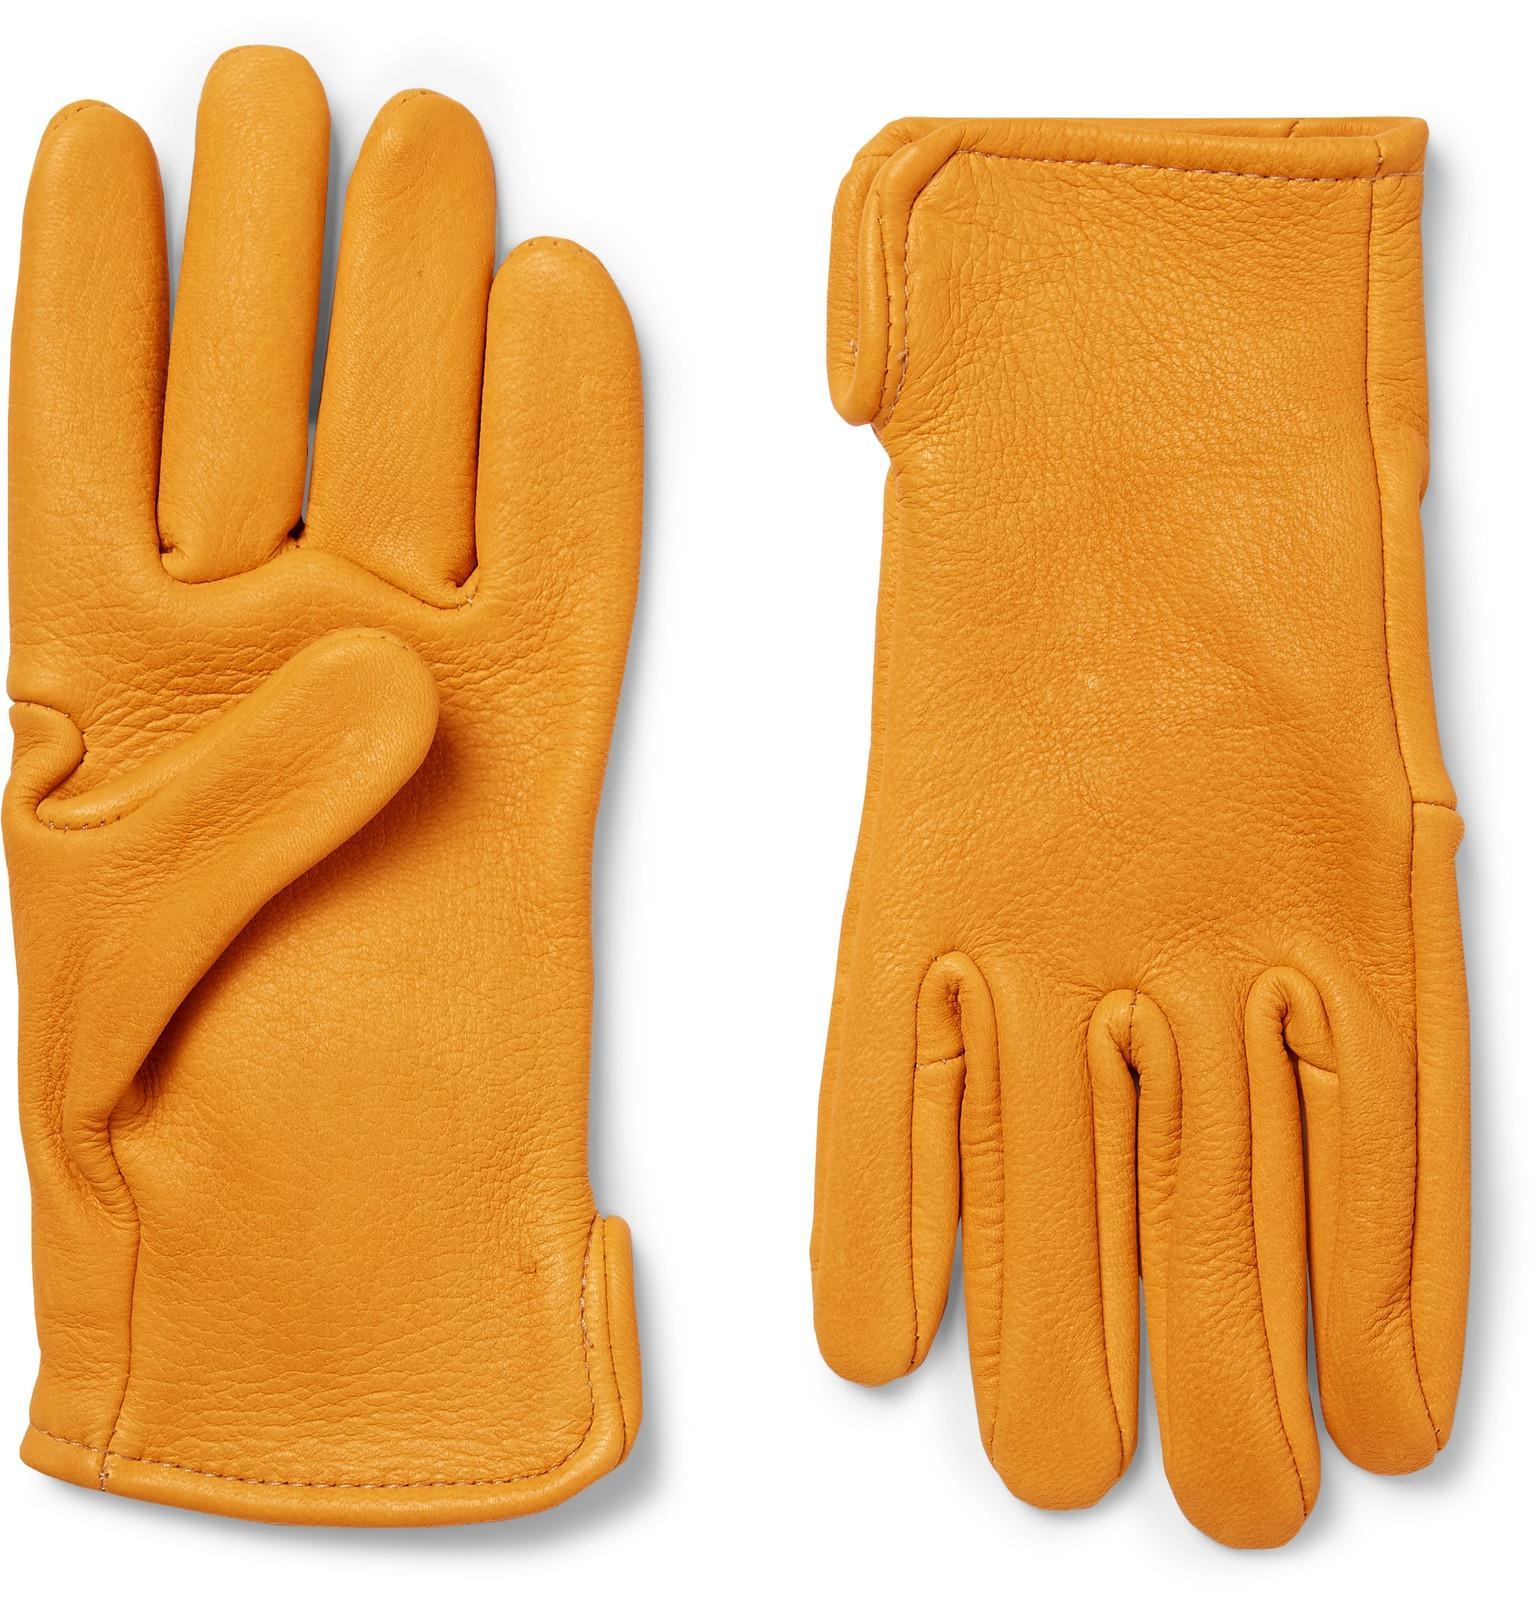 ab444f20378cb Deerskin Roper Gloves Uk - The Best Quality Gloves